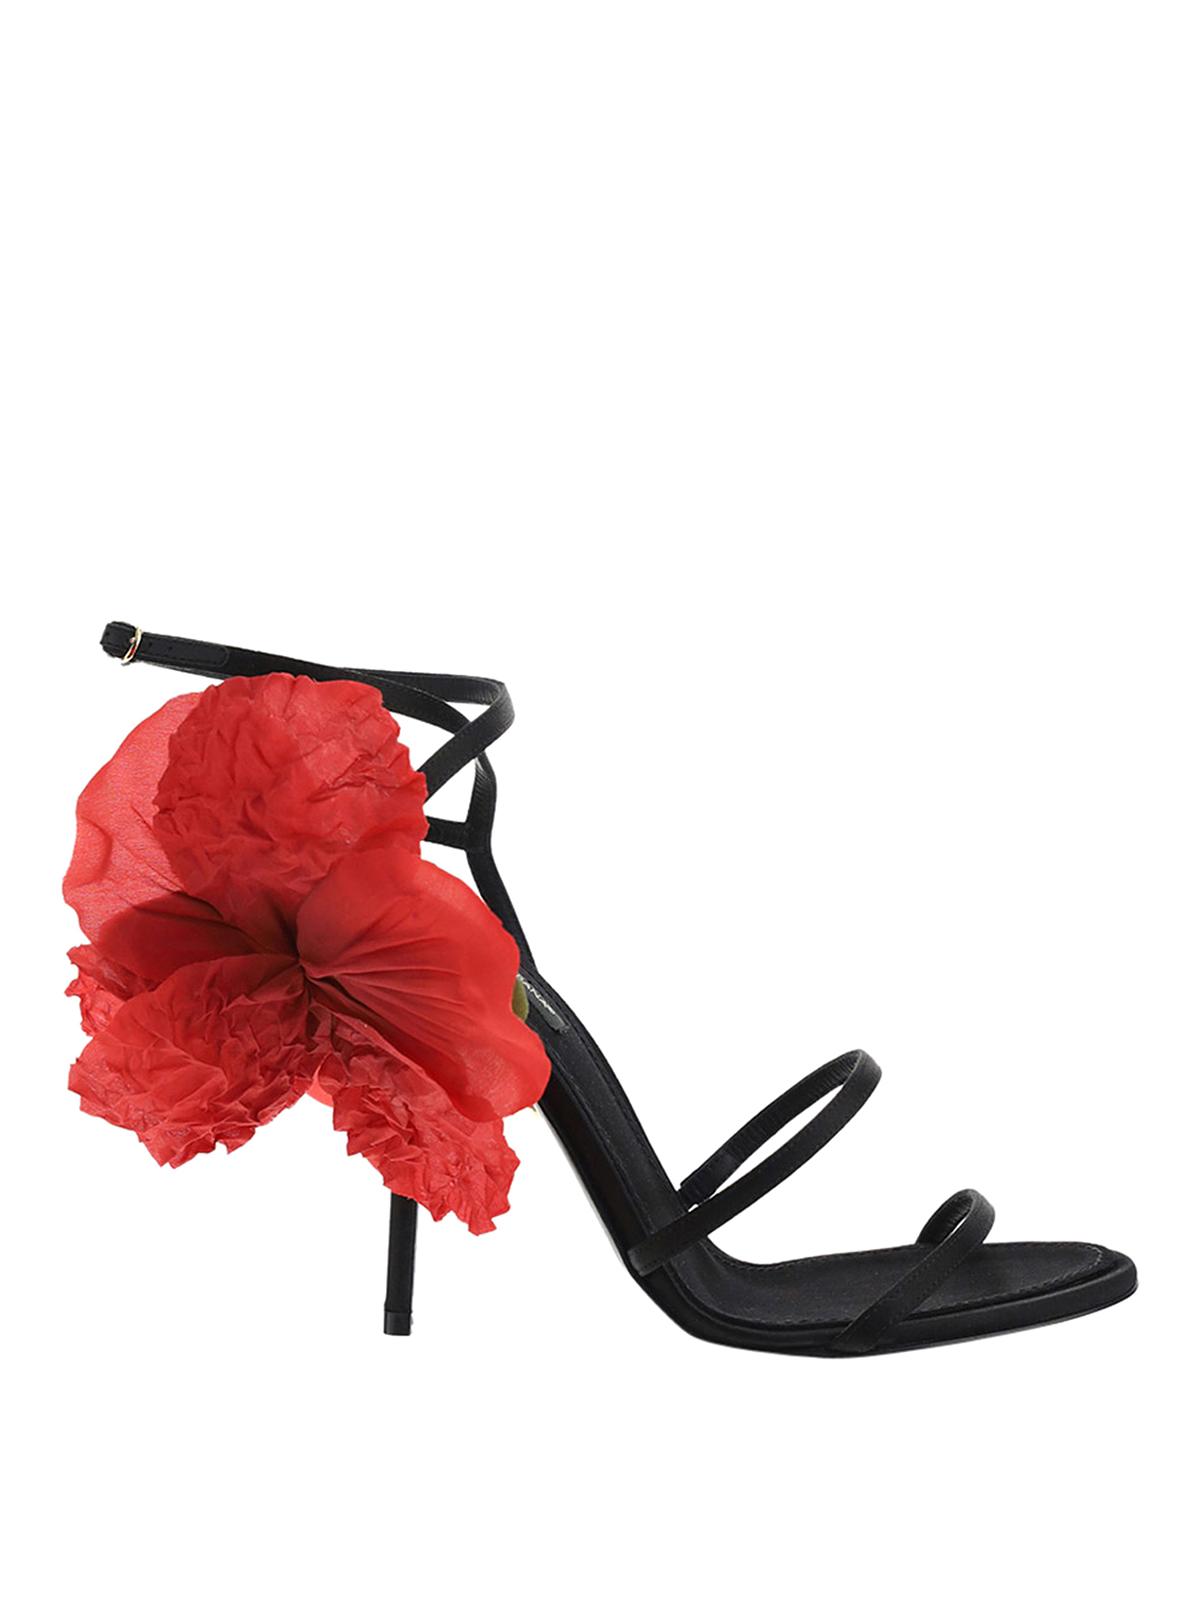 Dolce & Gabbana Sandals KEIRA SANDALS